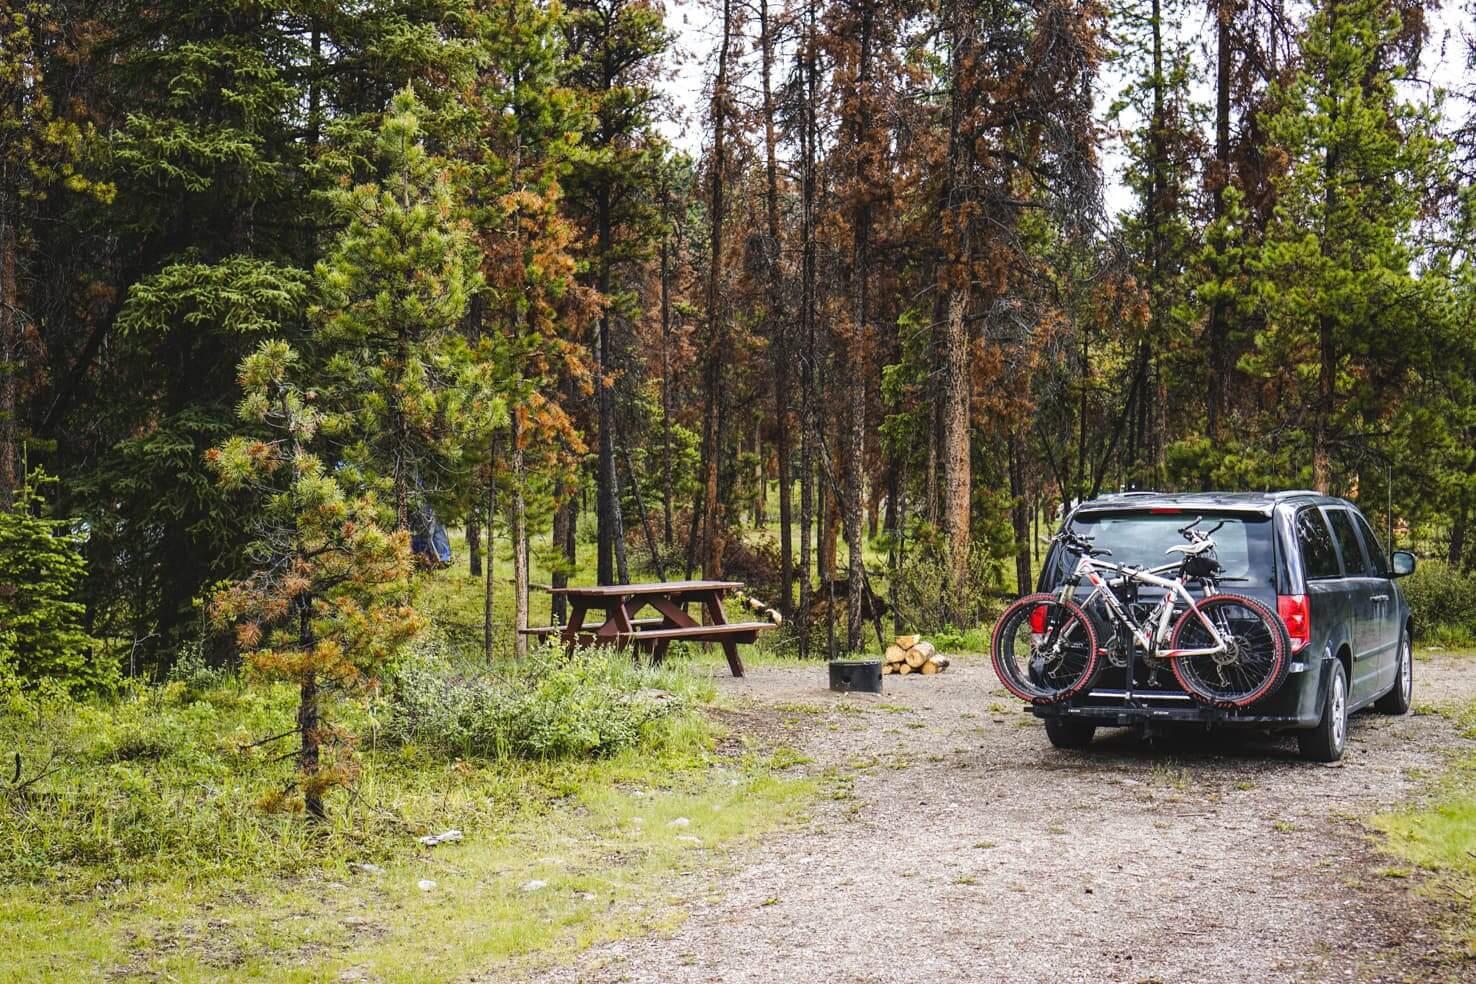 Canadian Rockies road trip itinerary - Camping in Jasper National Park